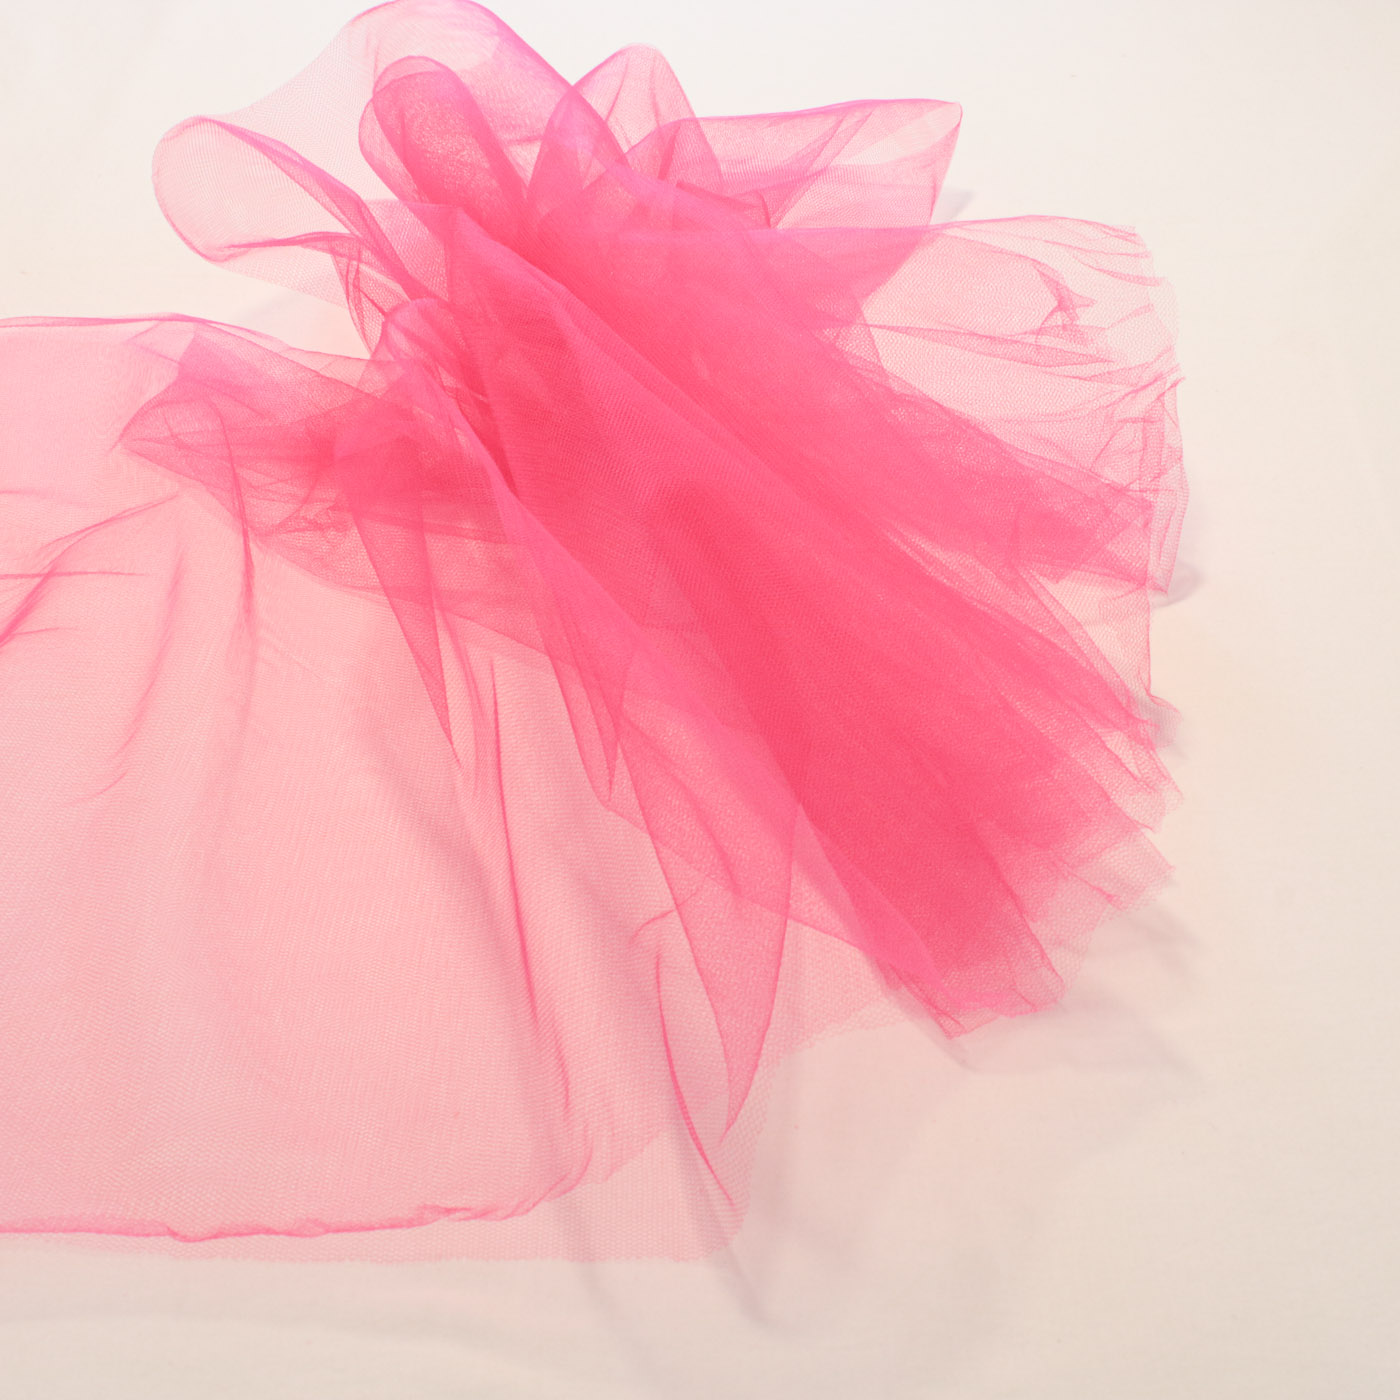 10 Metros Tecido Tule 100%Poliéster 1,20Mt Largura Rosa Pink